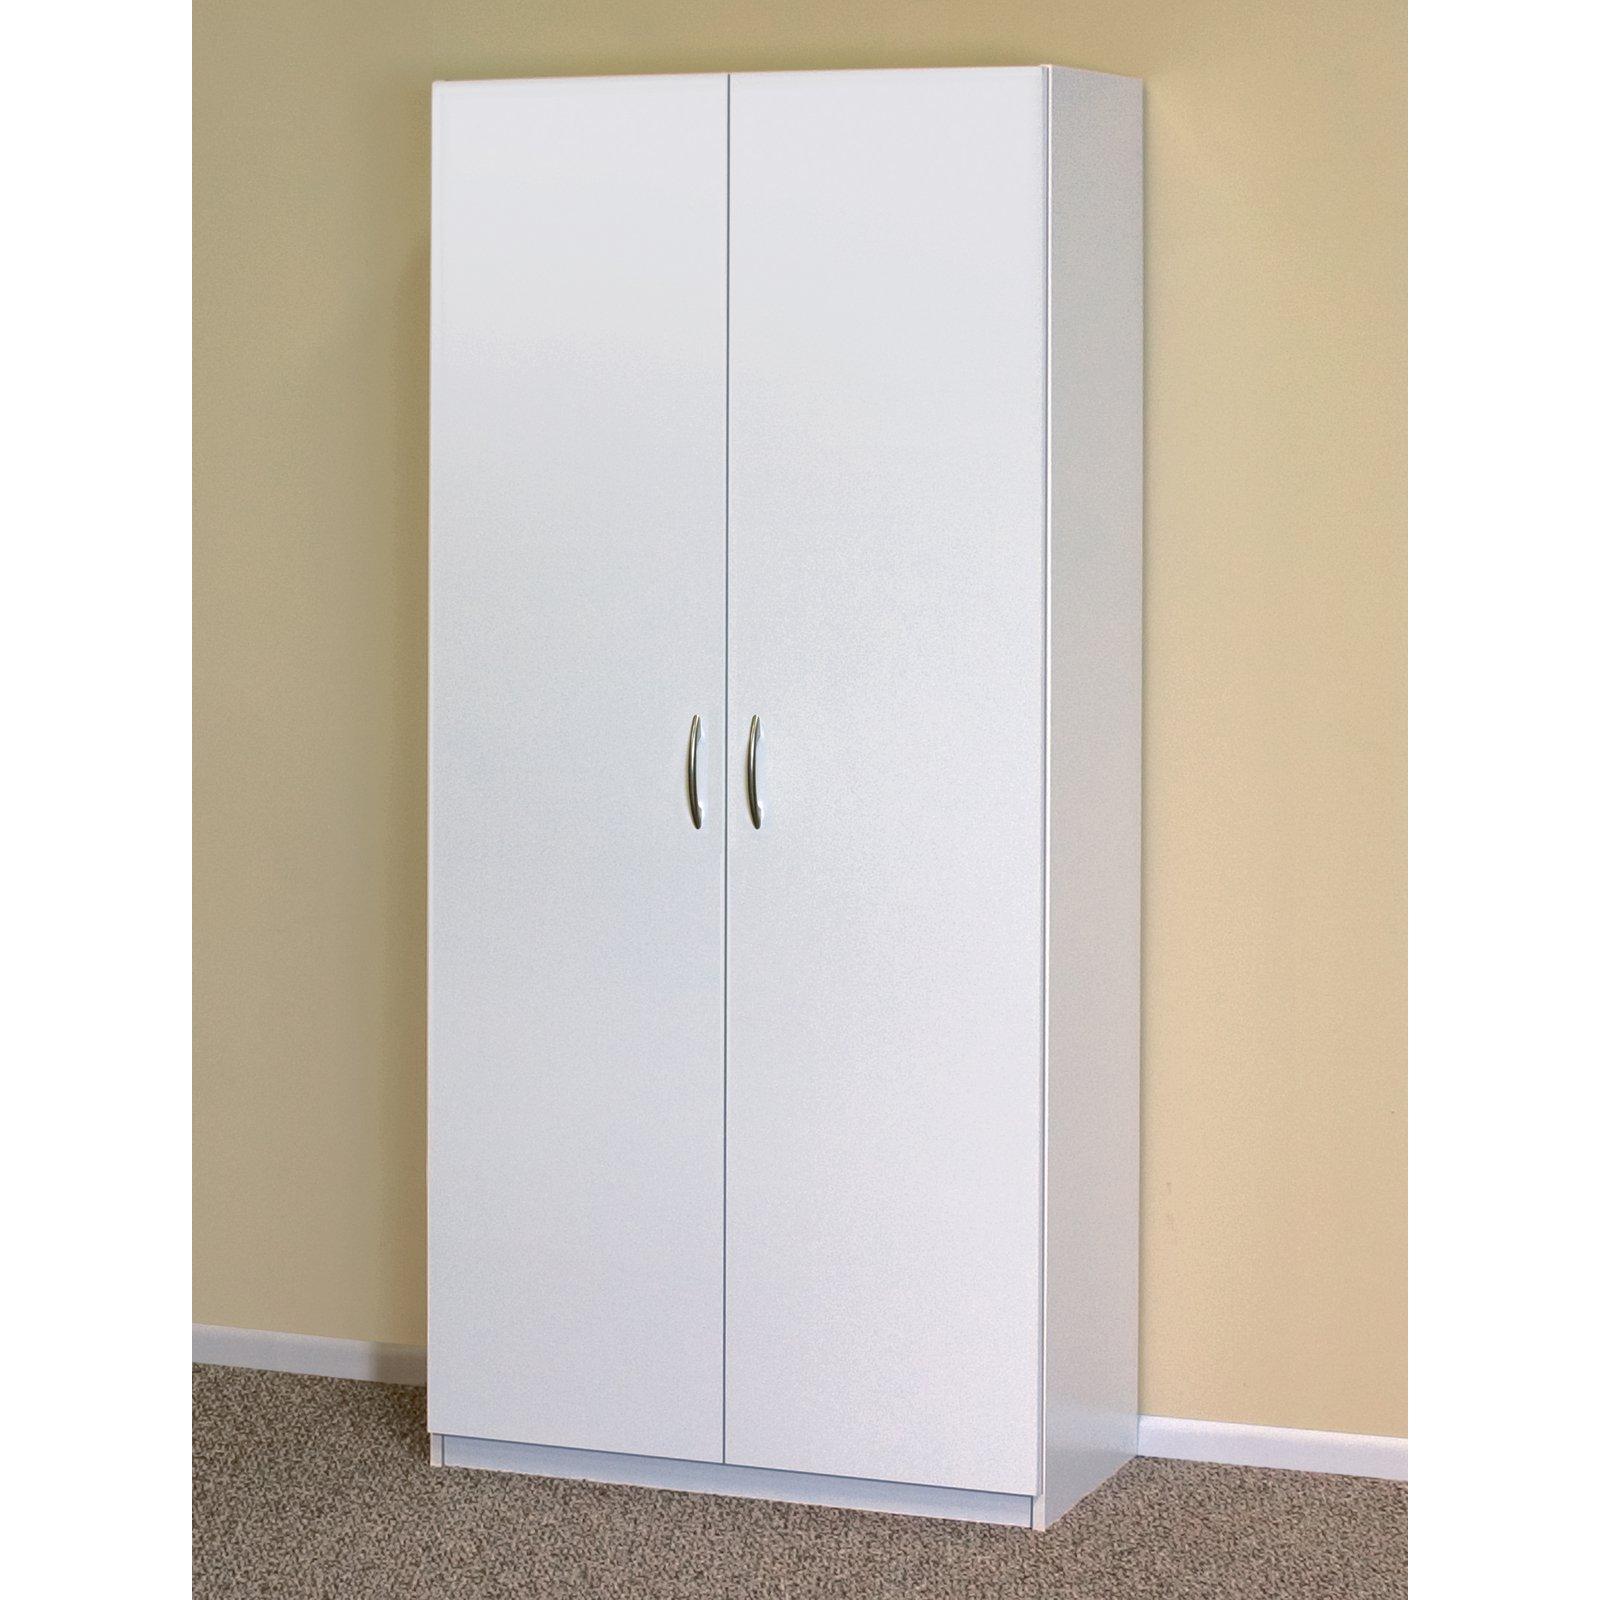 Wardrobe freestanding wardrobe cabinet - walmart.com DEDLMRX